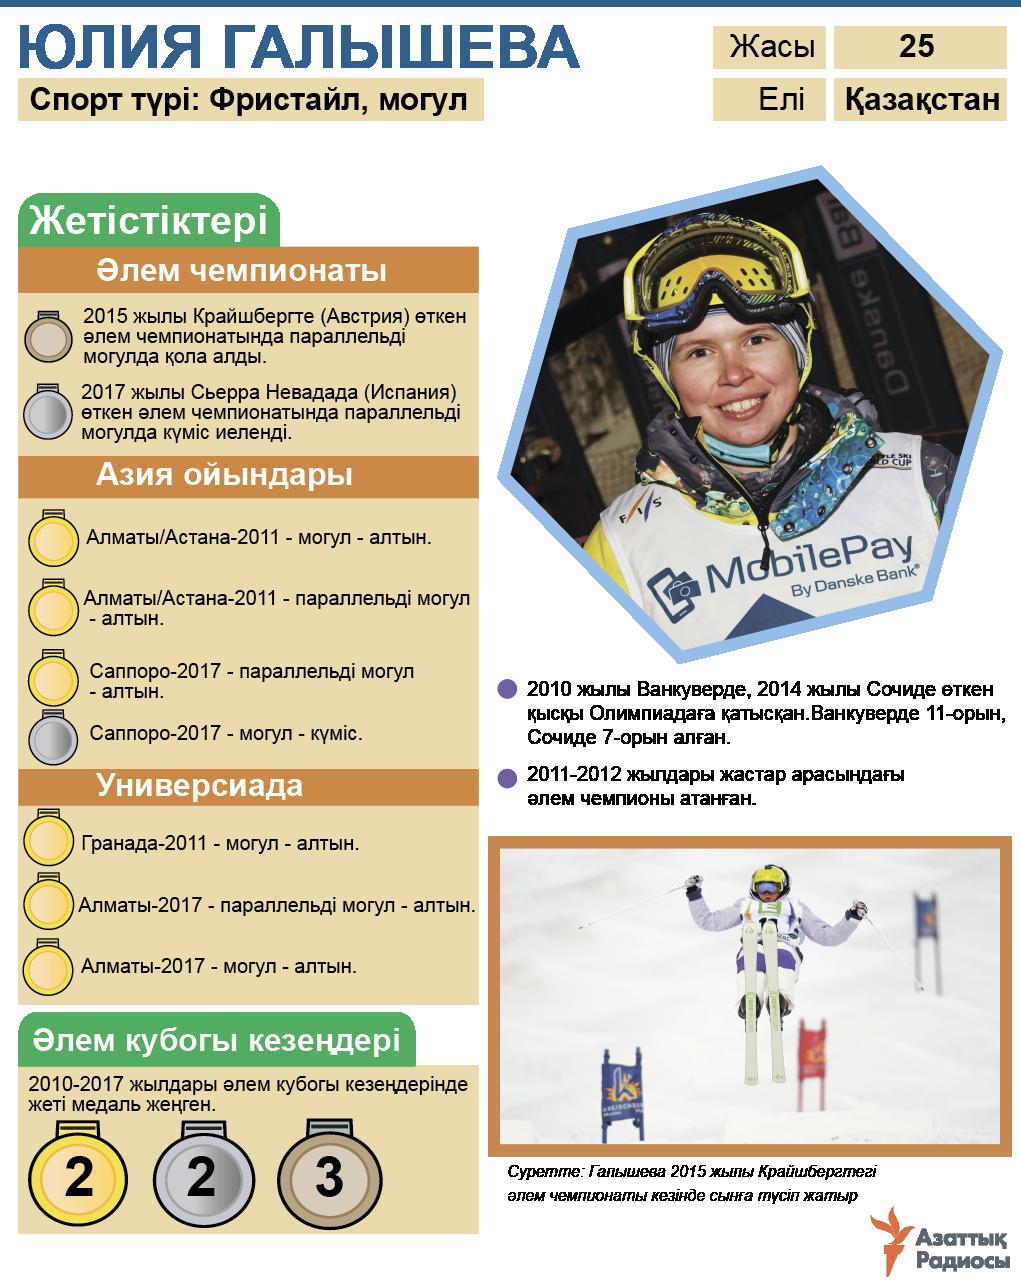 infographic about Yulia Galysheva